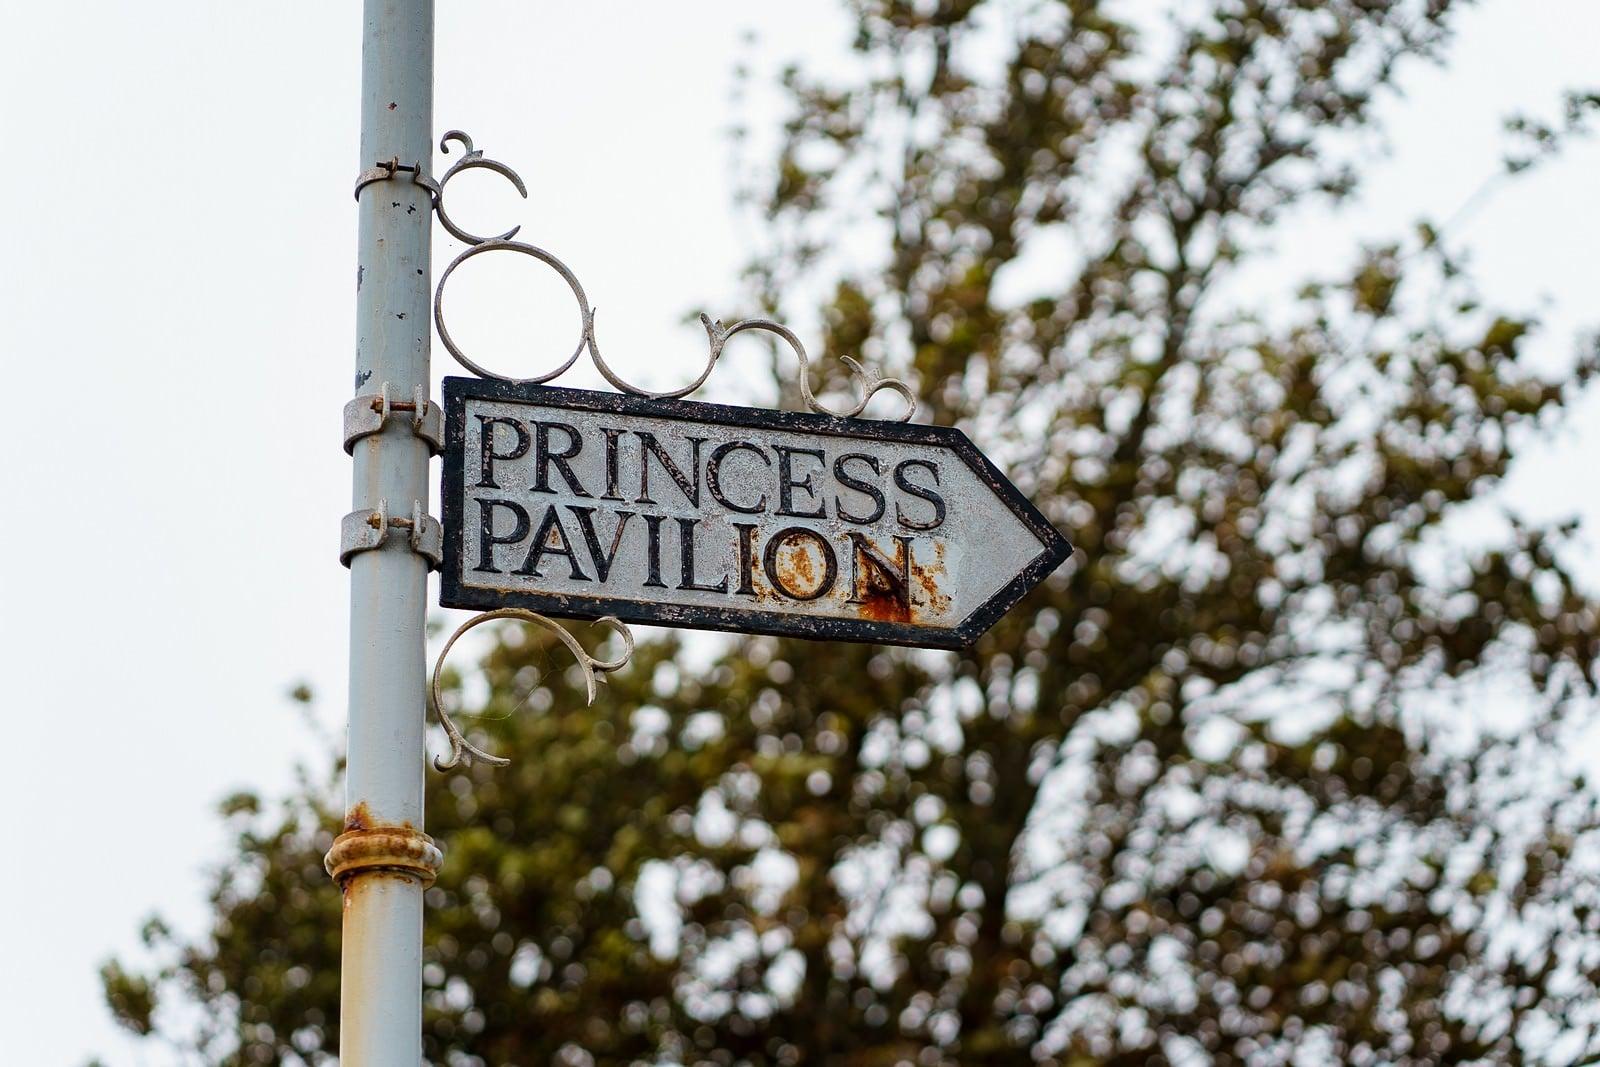 Princess pavillions wedding venue in falmouth